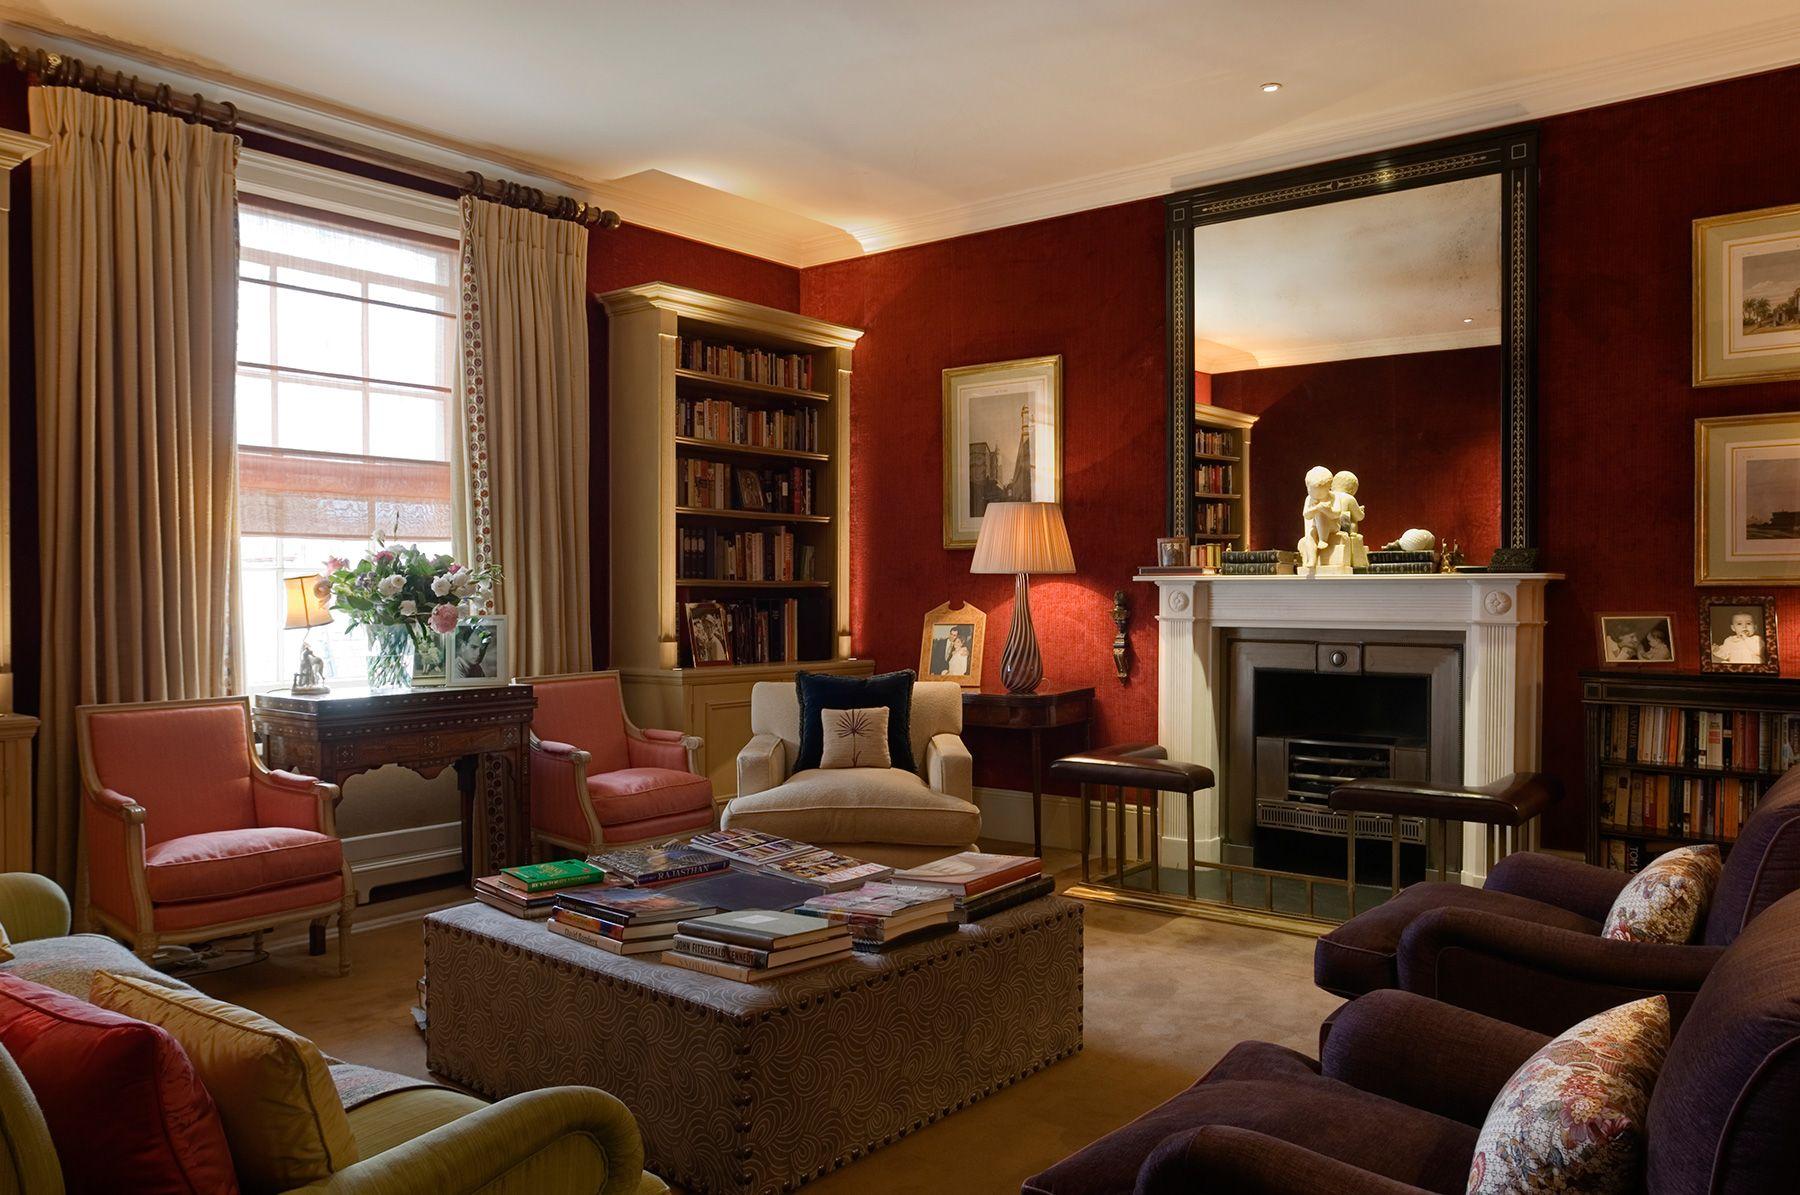 INTERIOR DESIGN LONDON HOUSES Pimlico